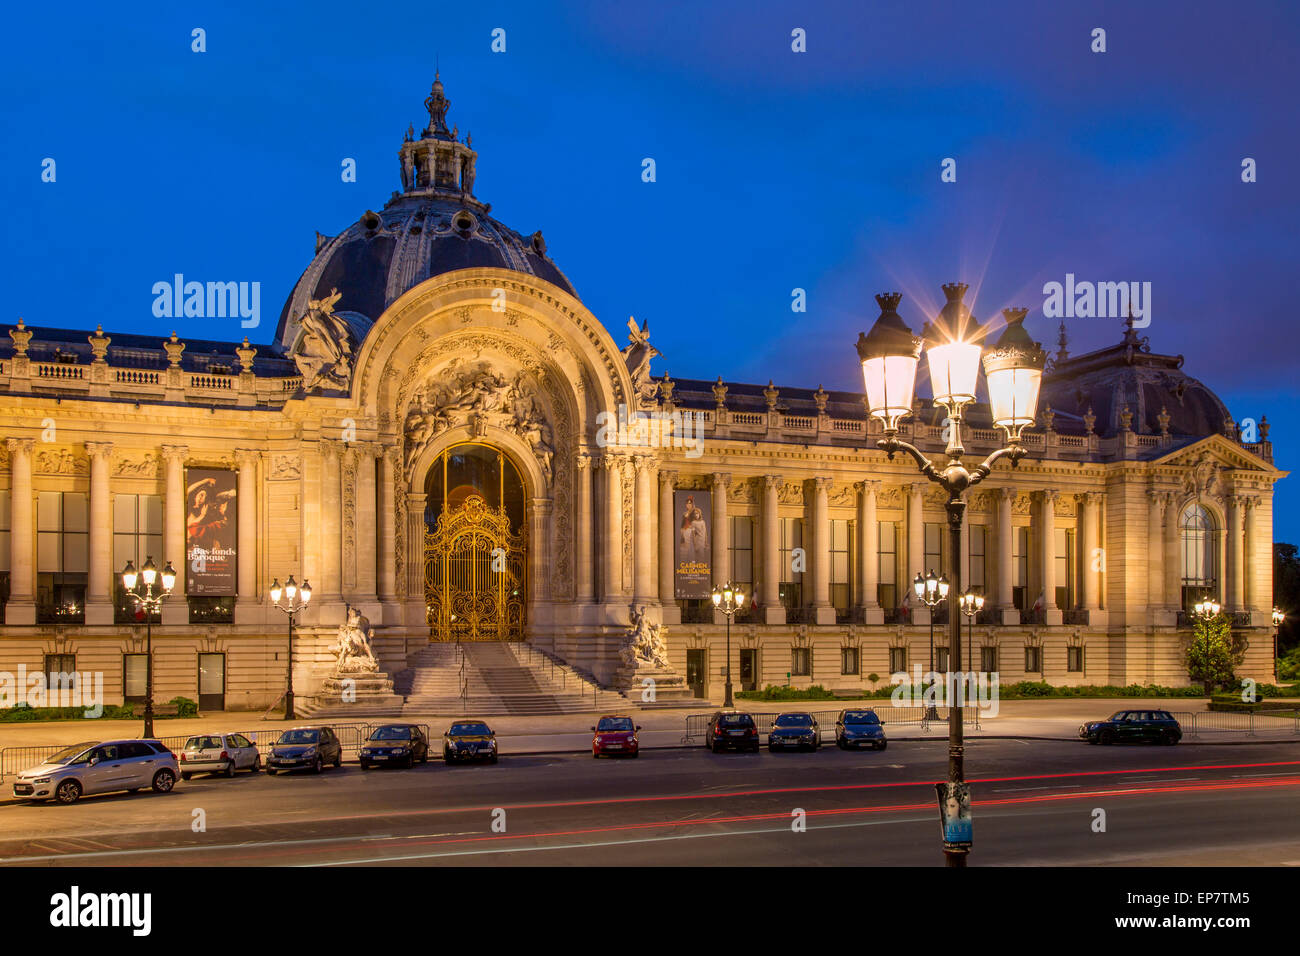 Twilight at Petite Palais, Paris France - Stock Image